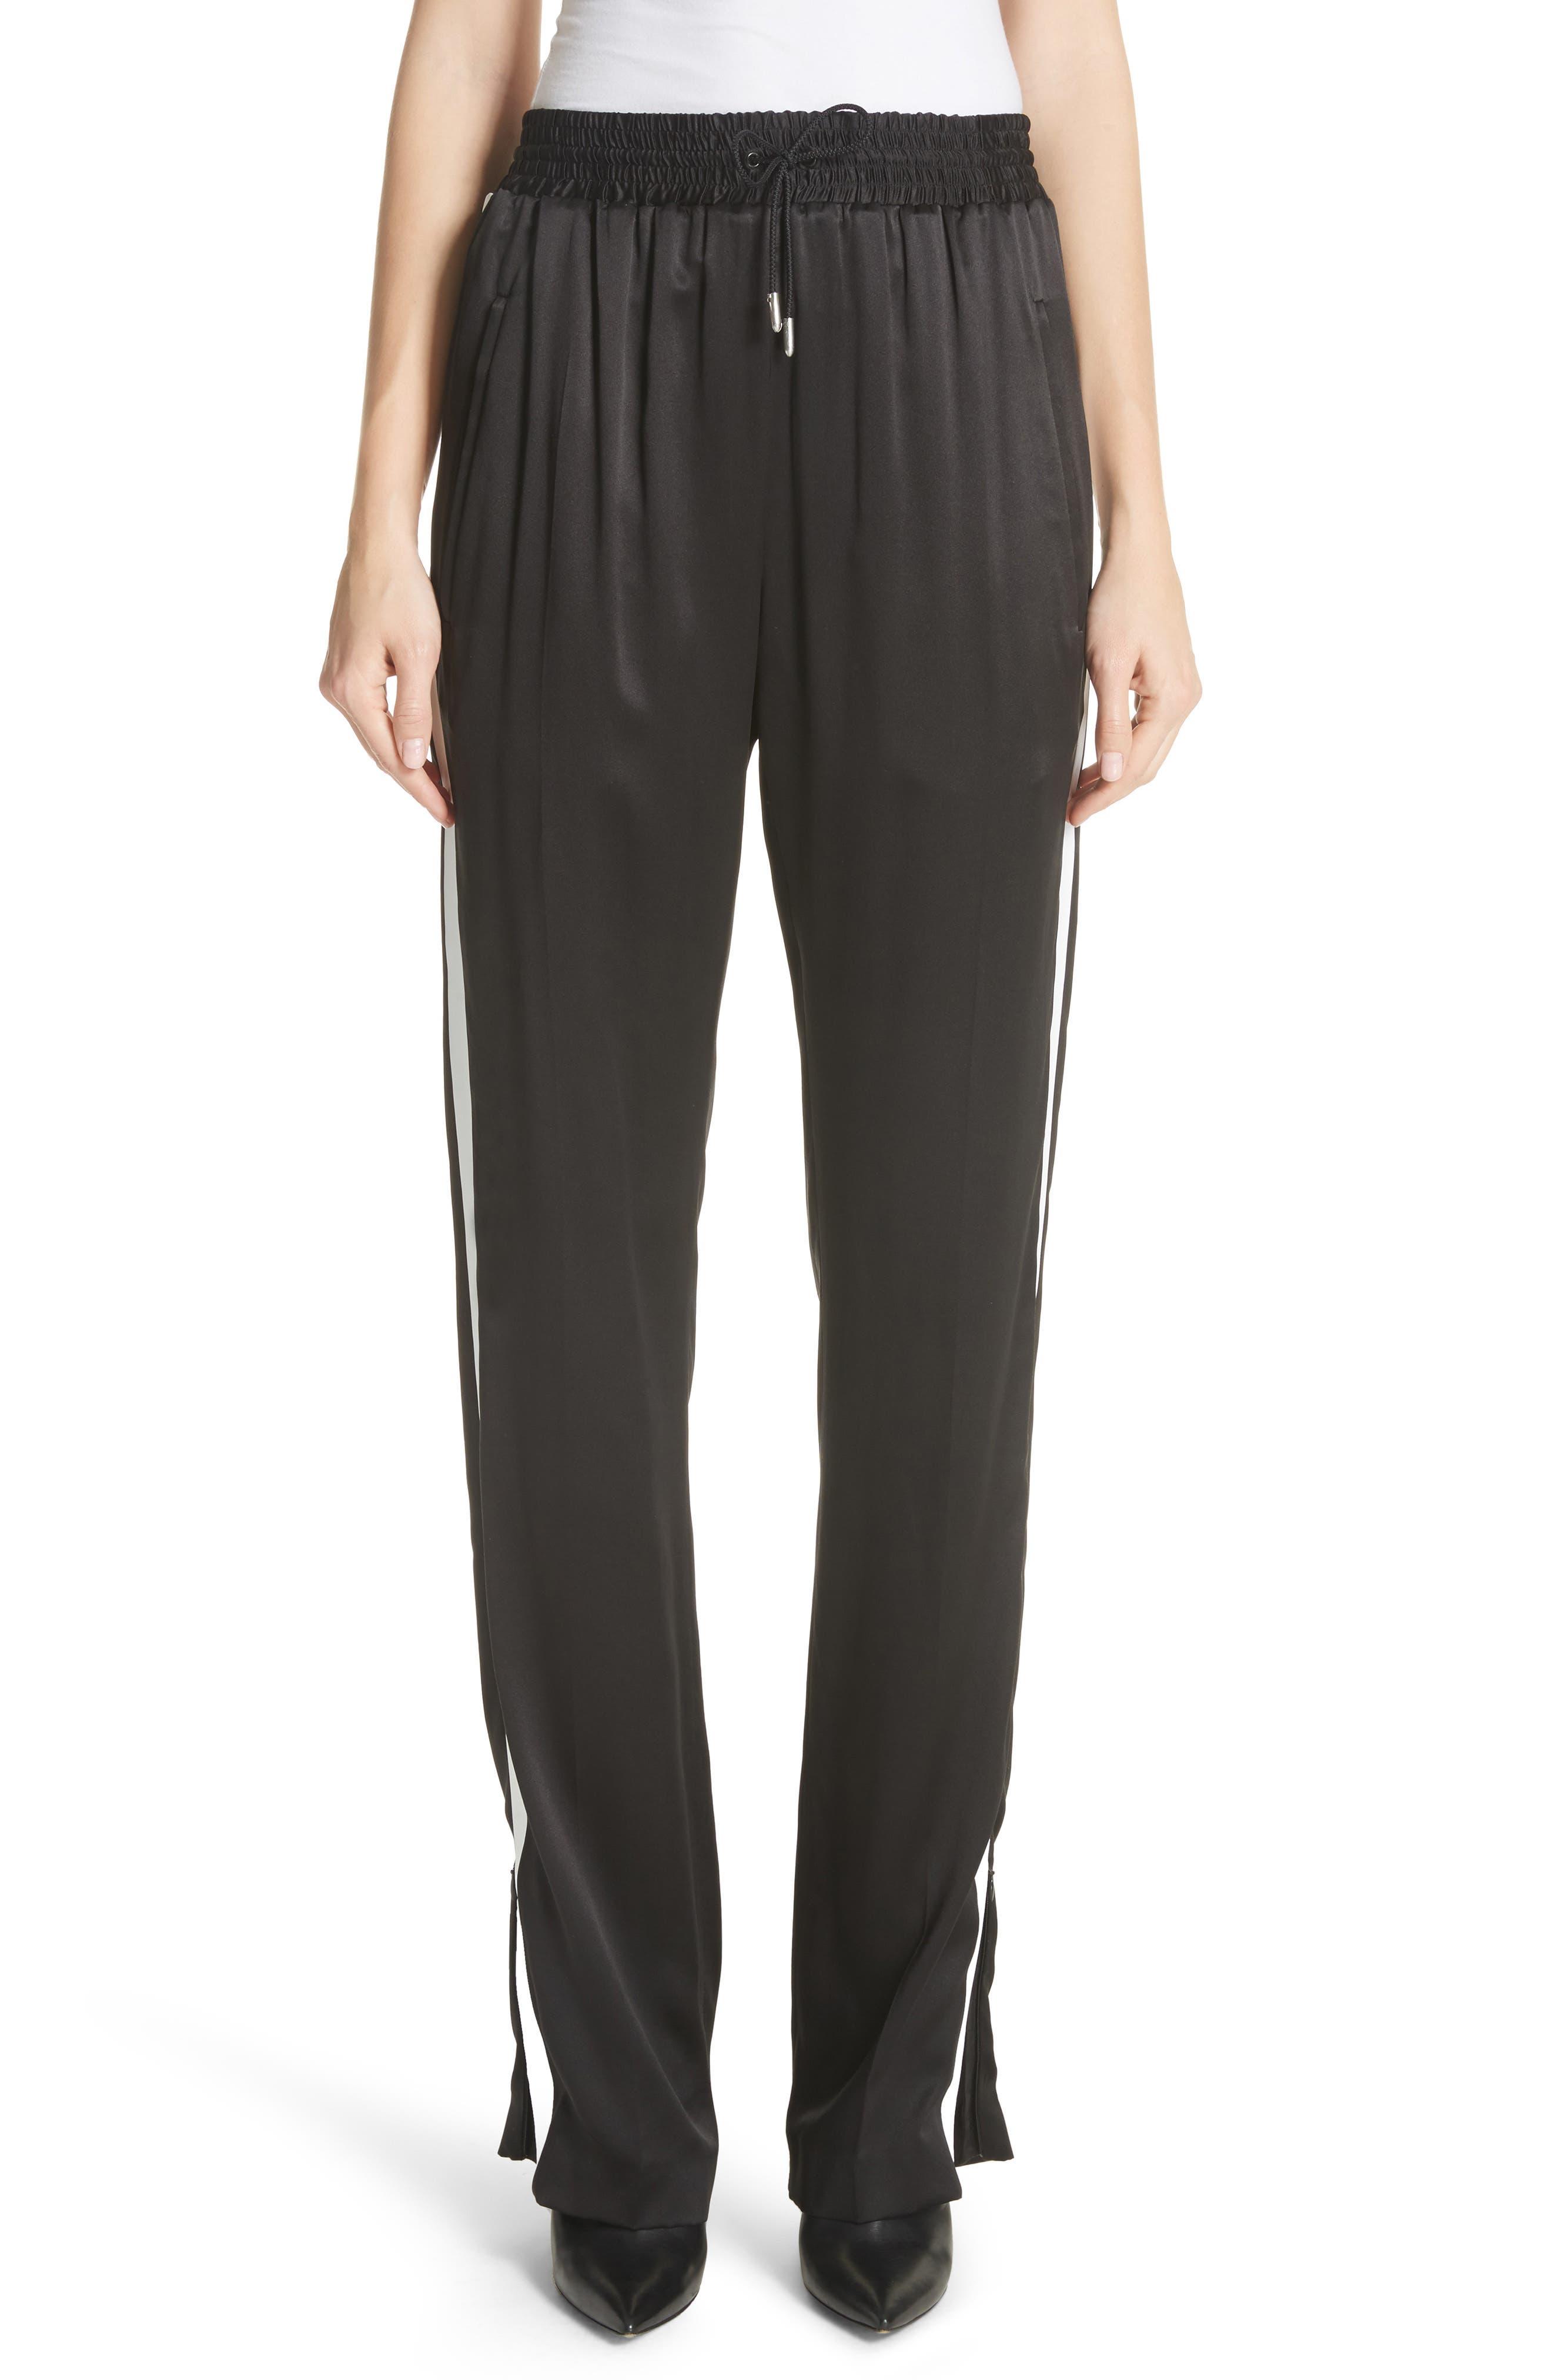 Burberry Tanley Silk Track Pants